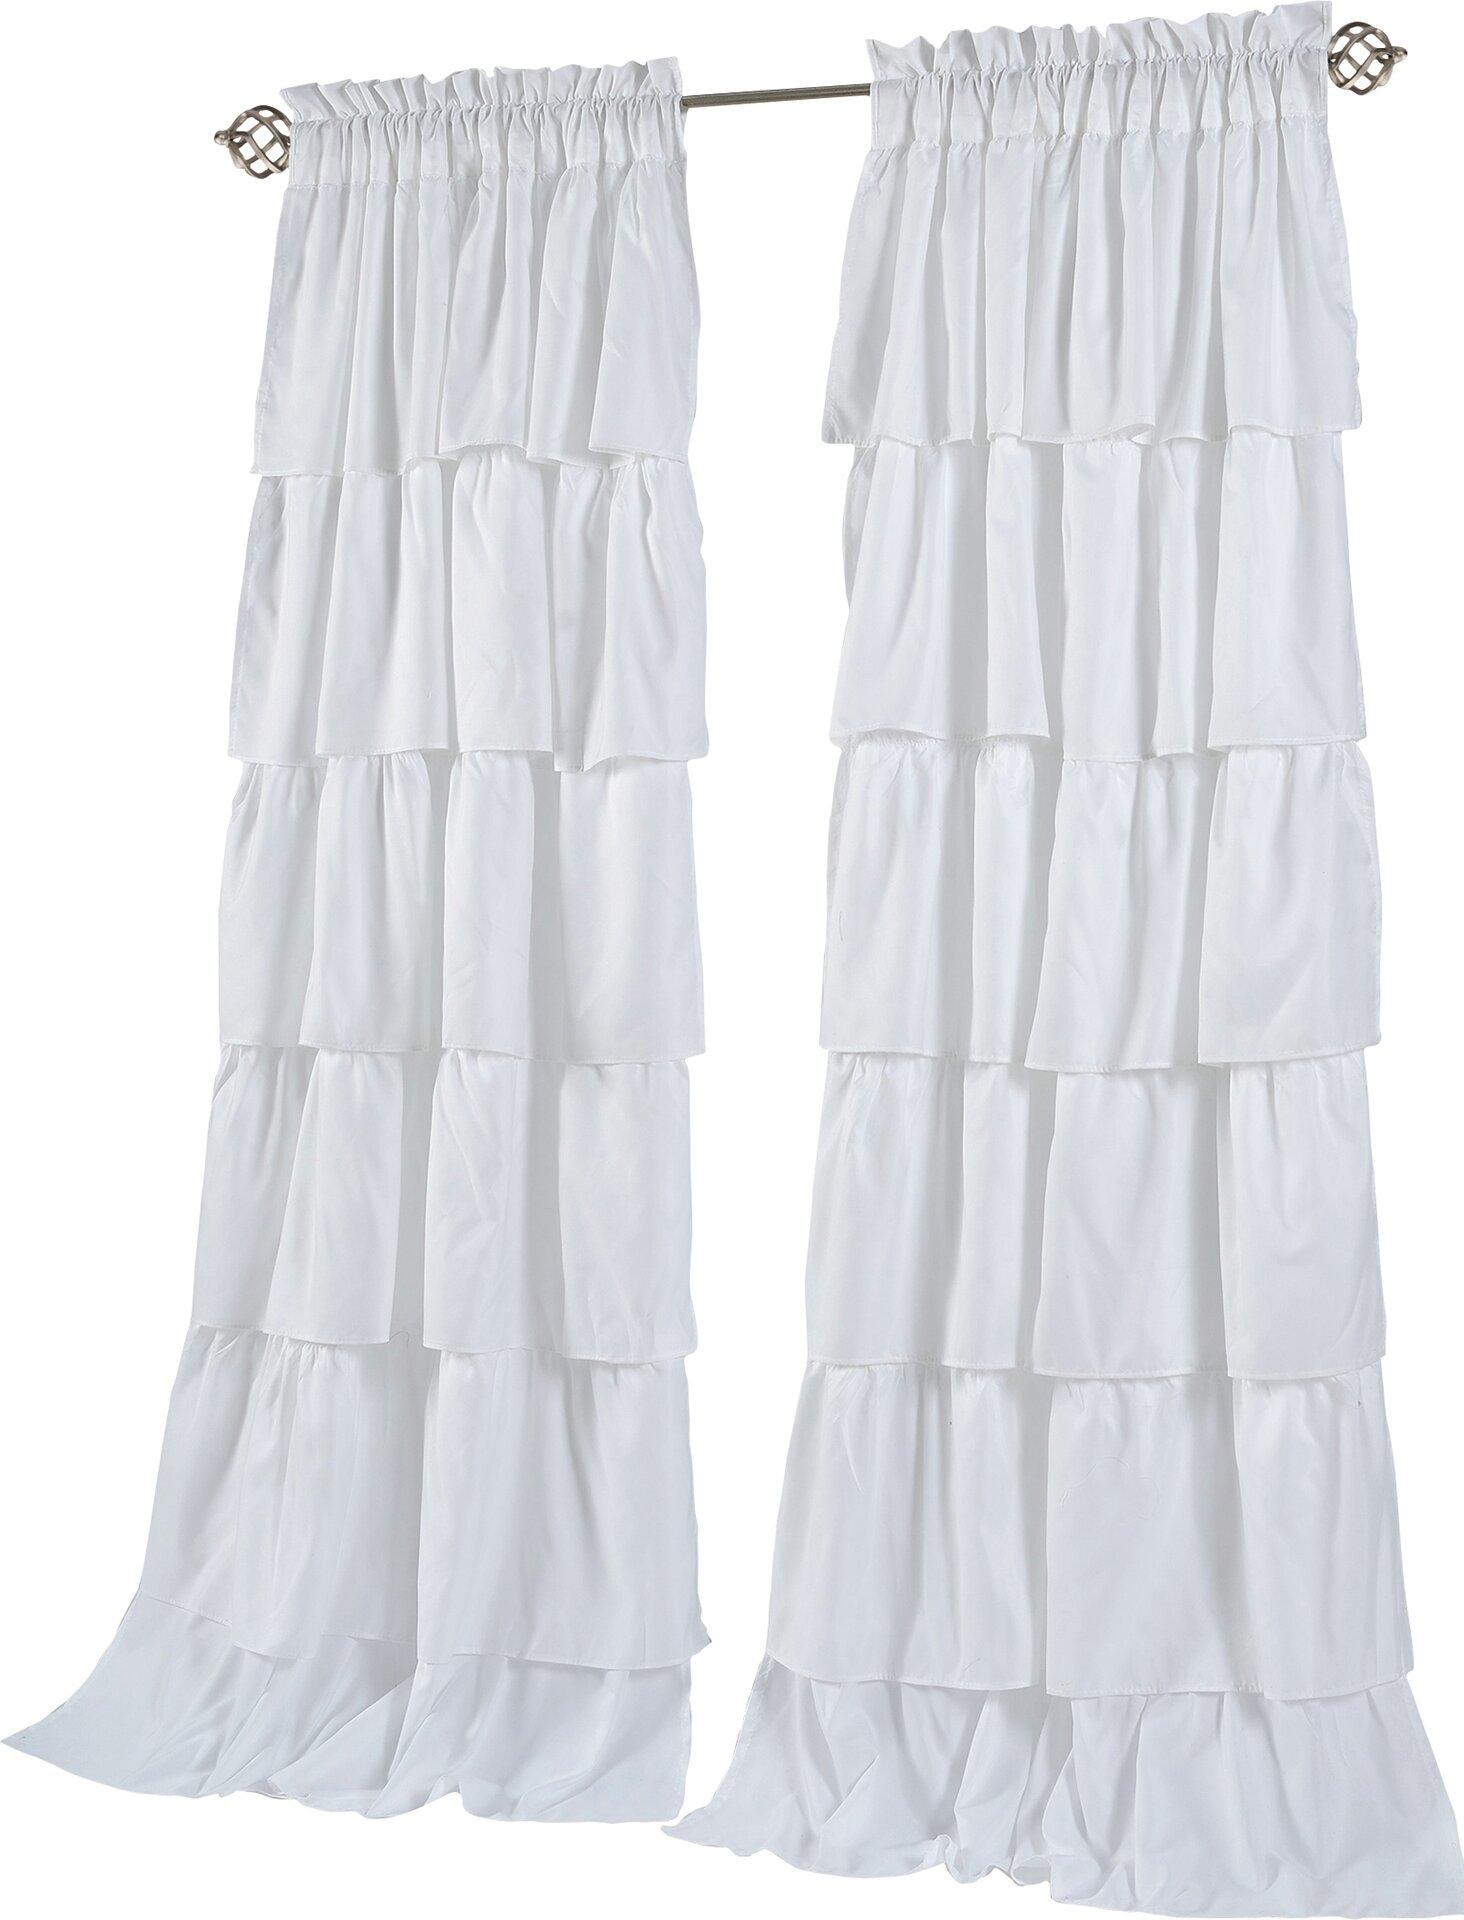 custom white ruffle curtains panel pure make curtain